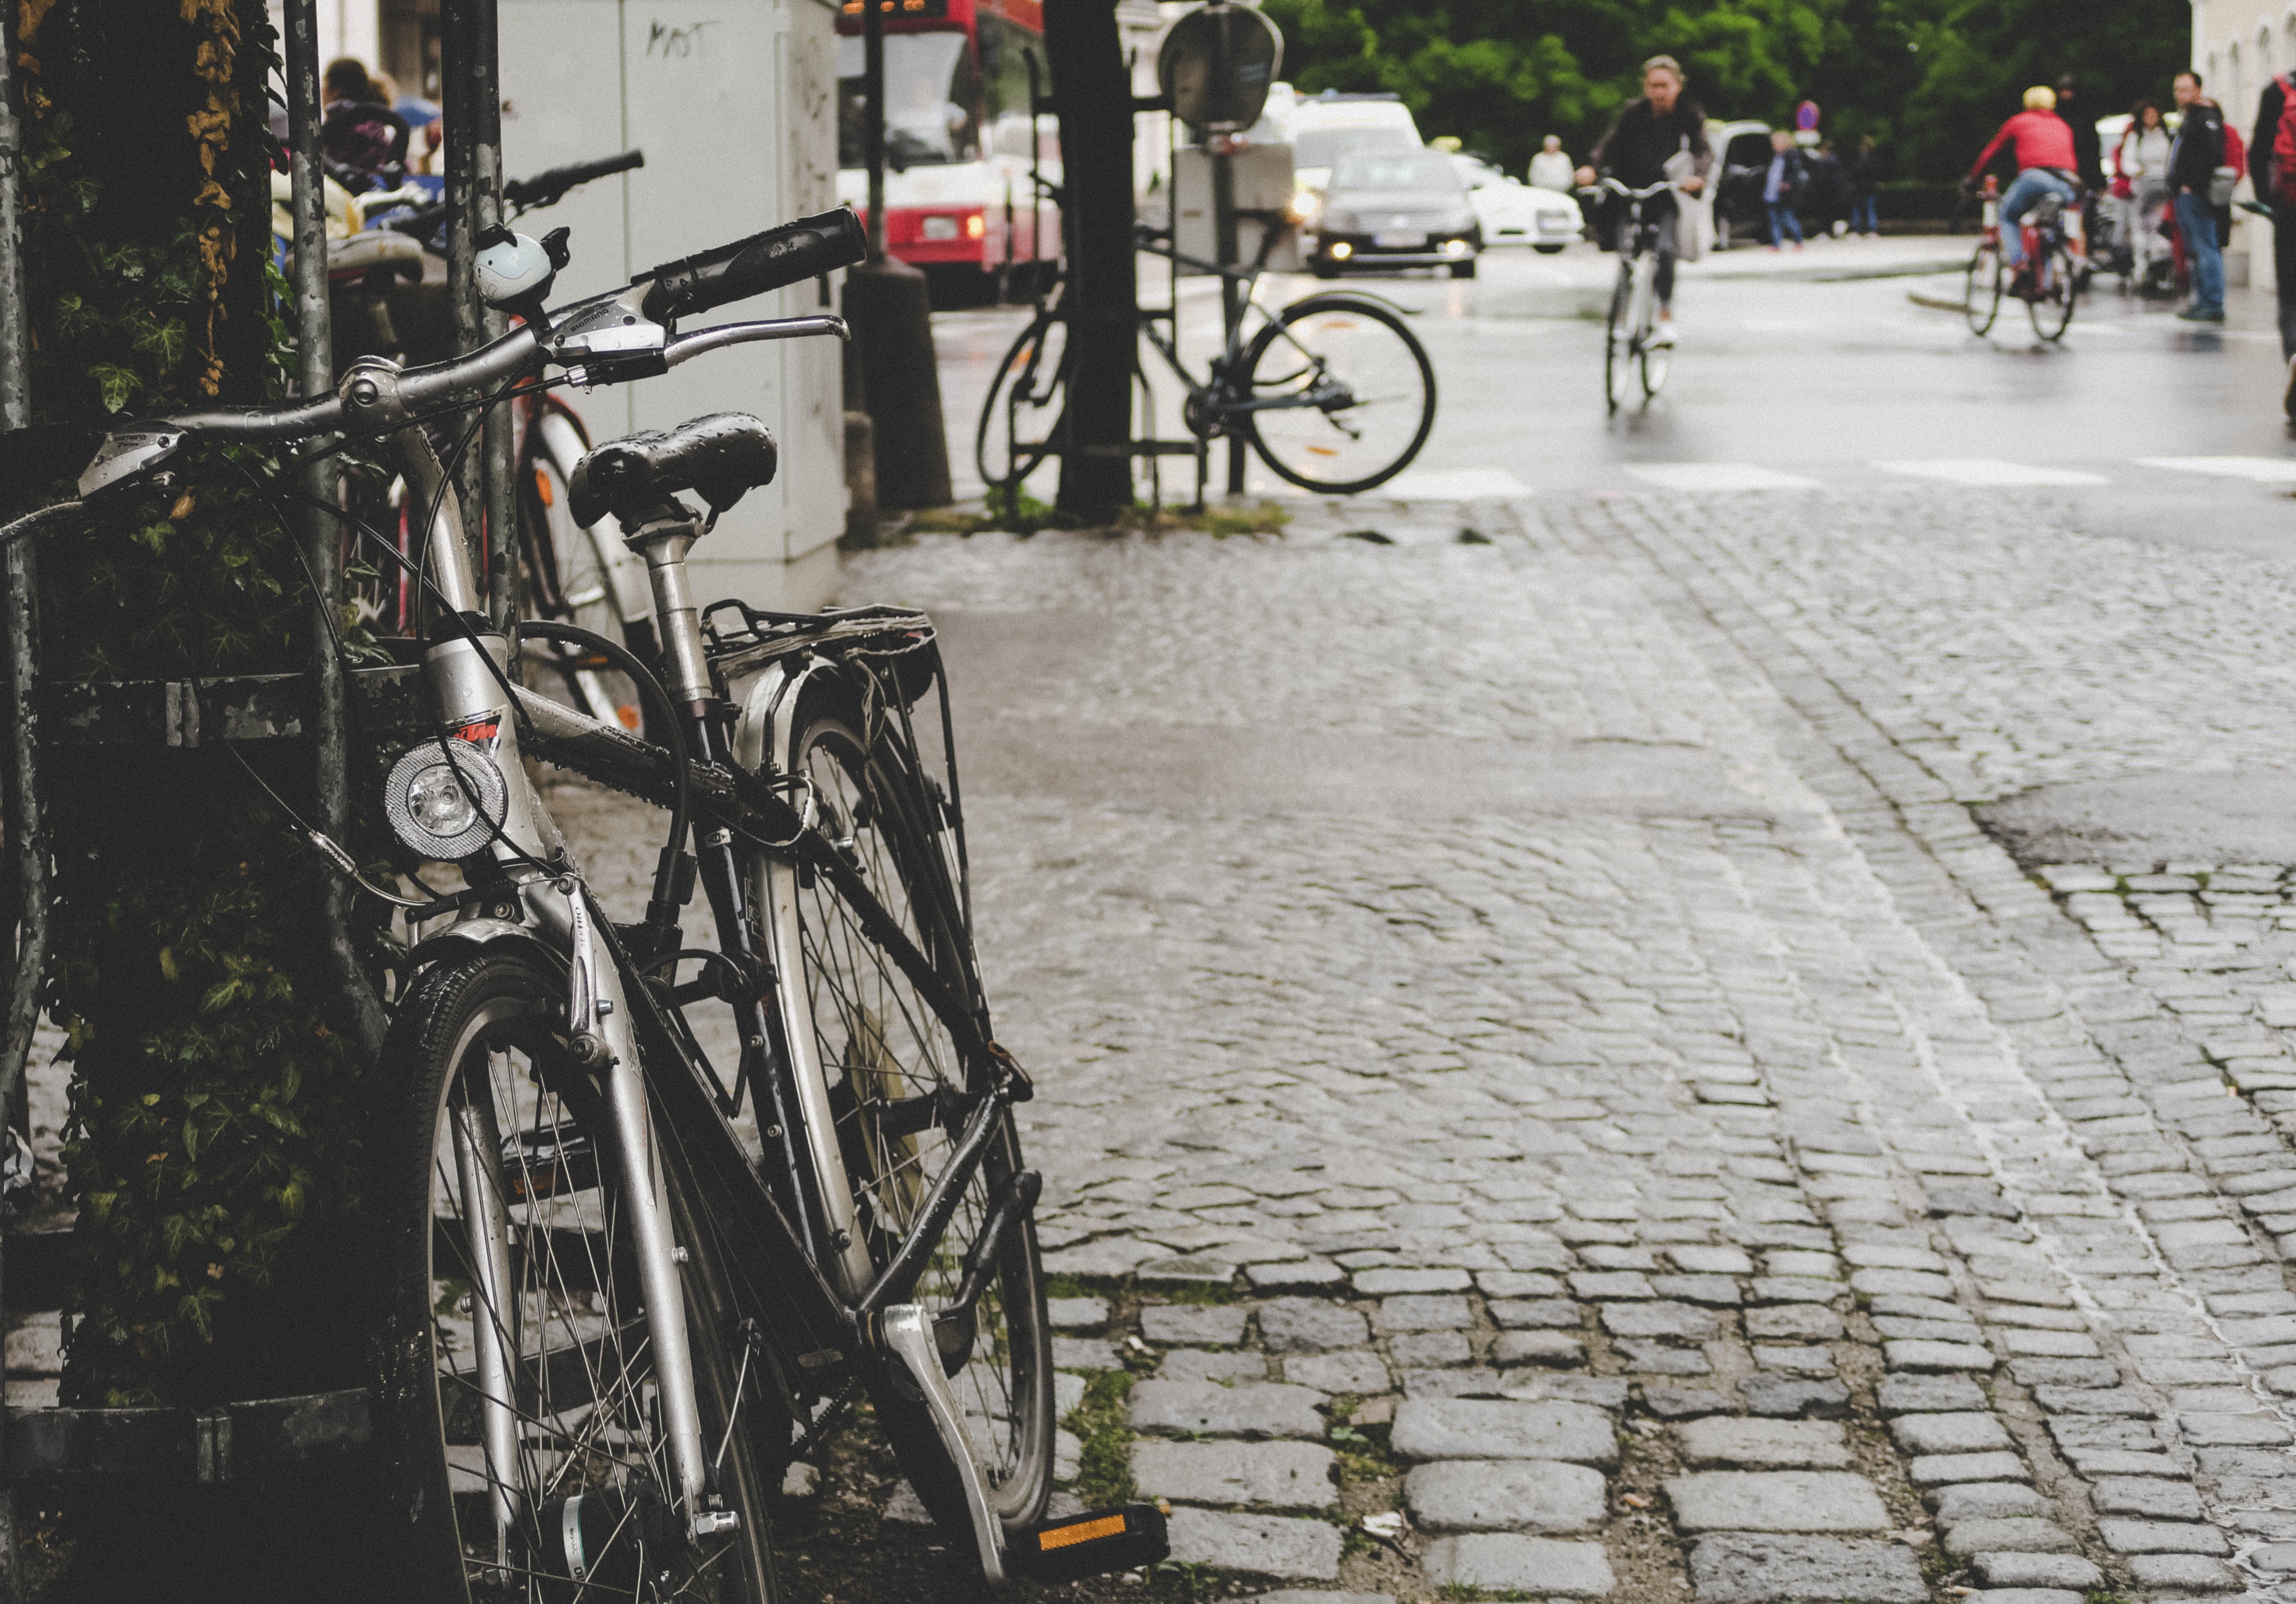 bike on side street at daytime